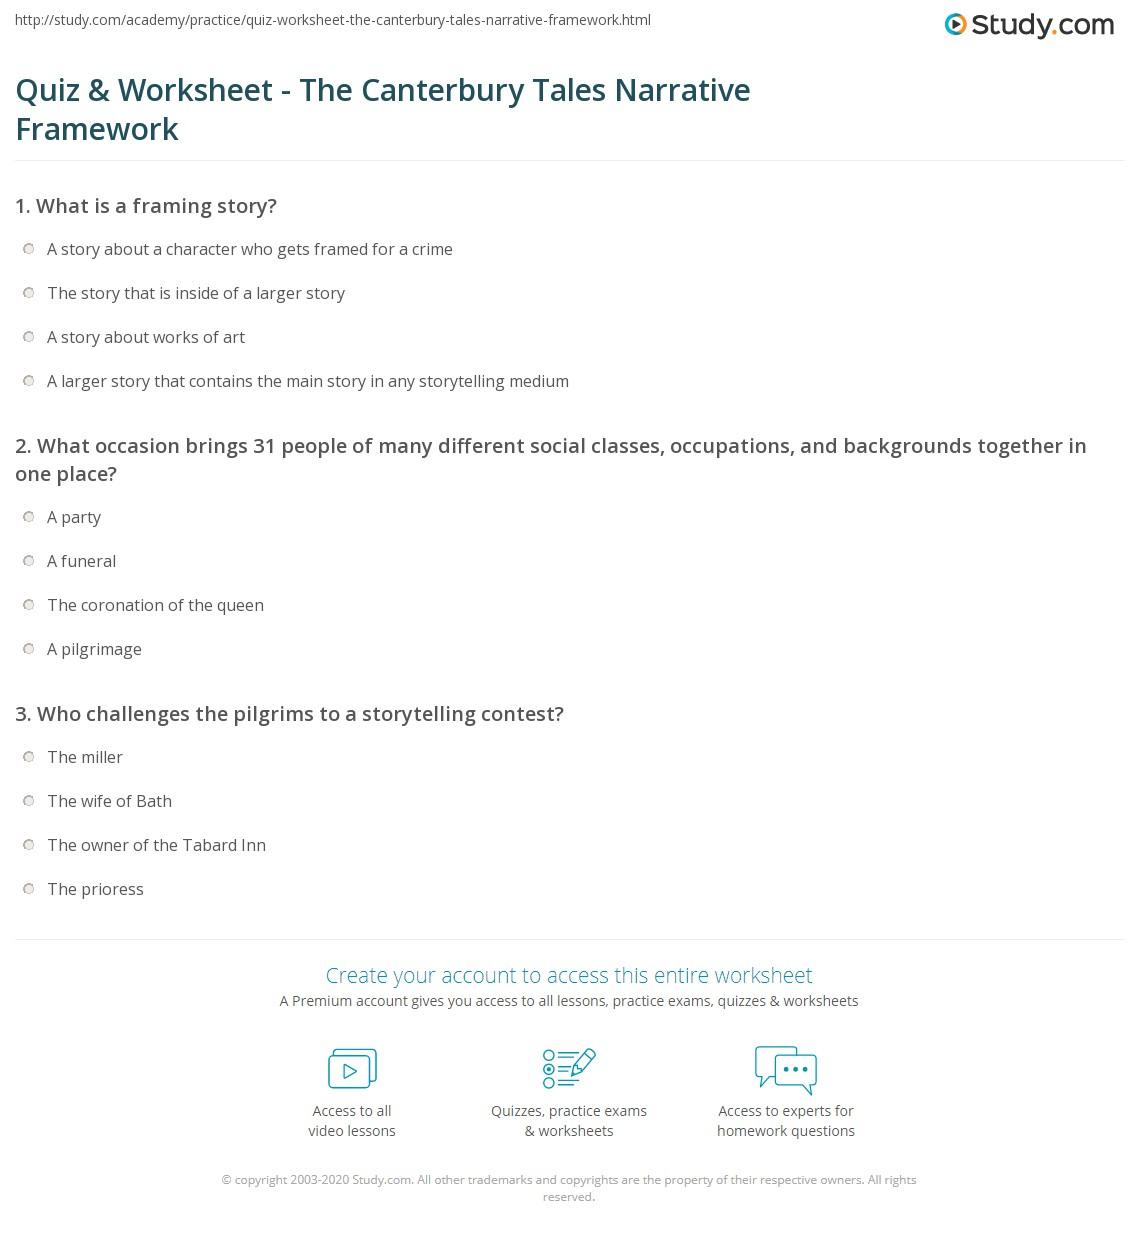 Quiz & Worksheet - The Canterbury Tales Narrative Framework | Study.com